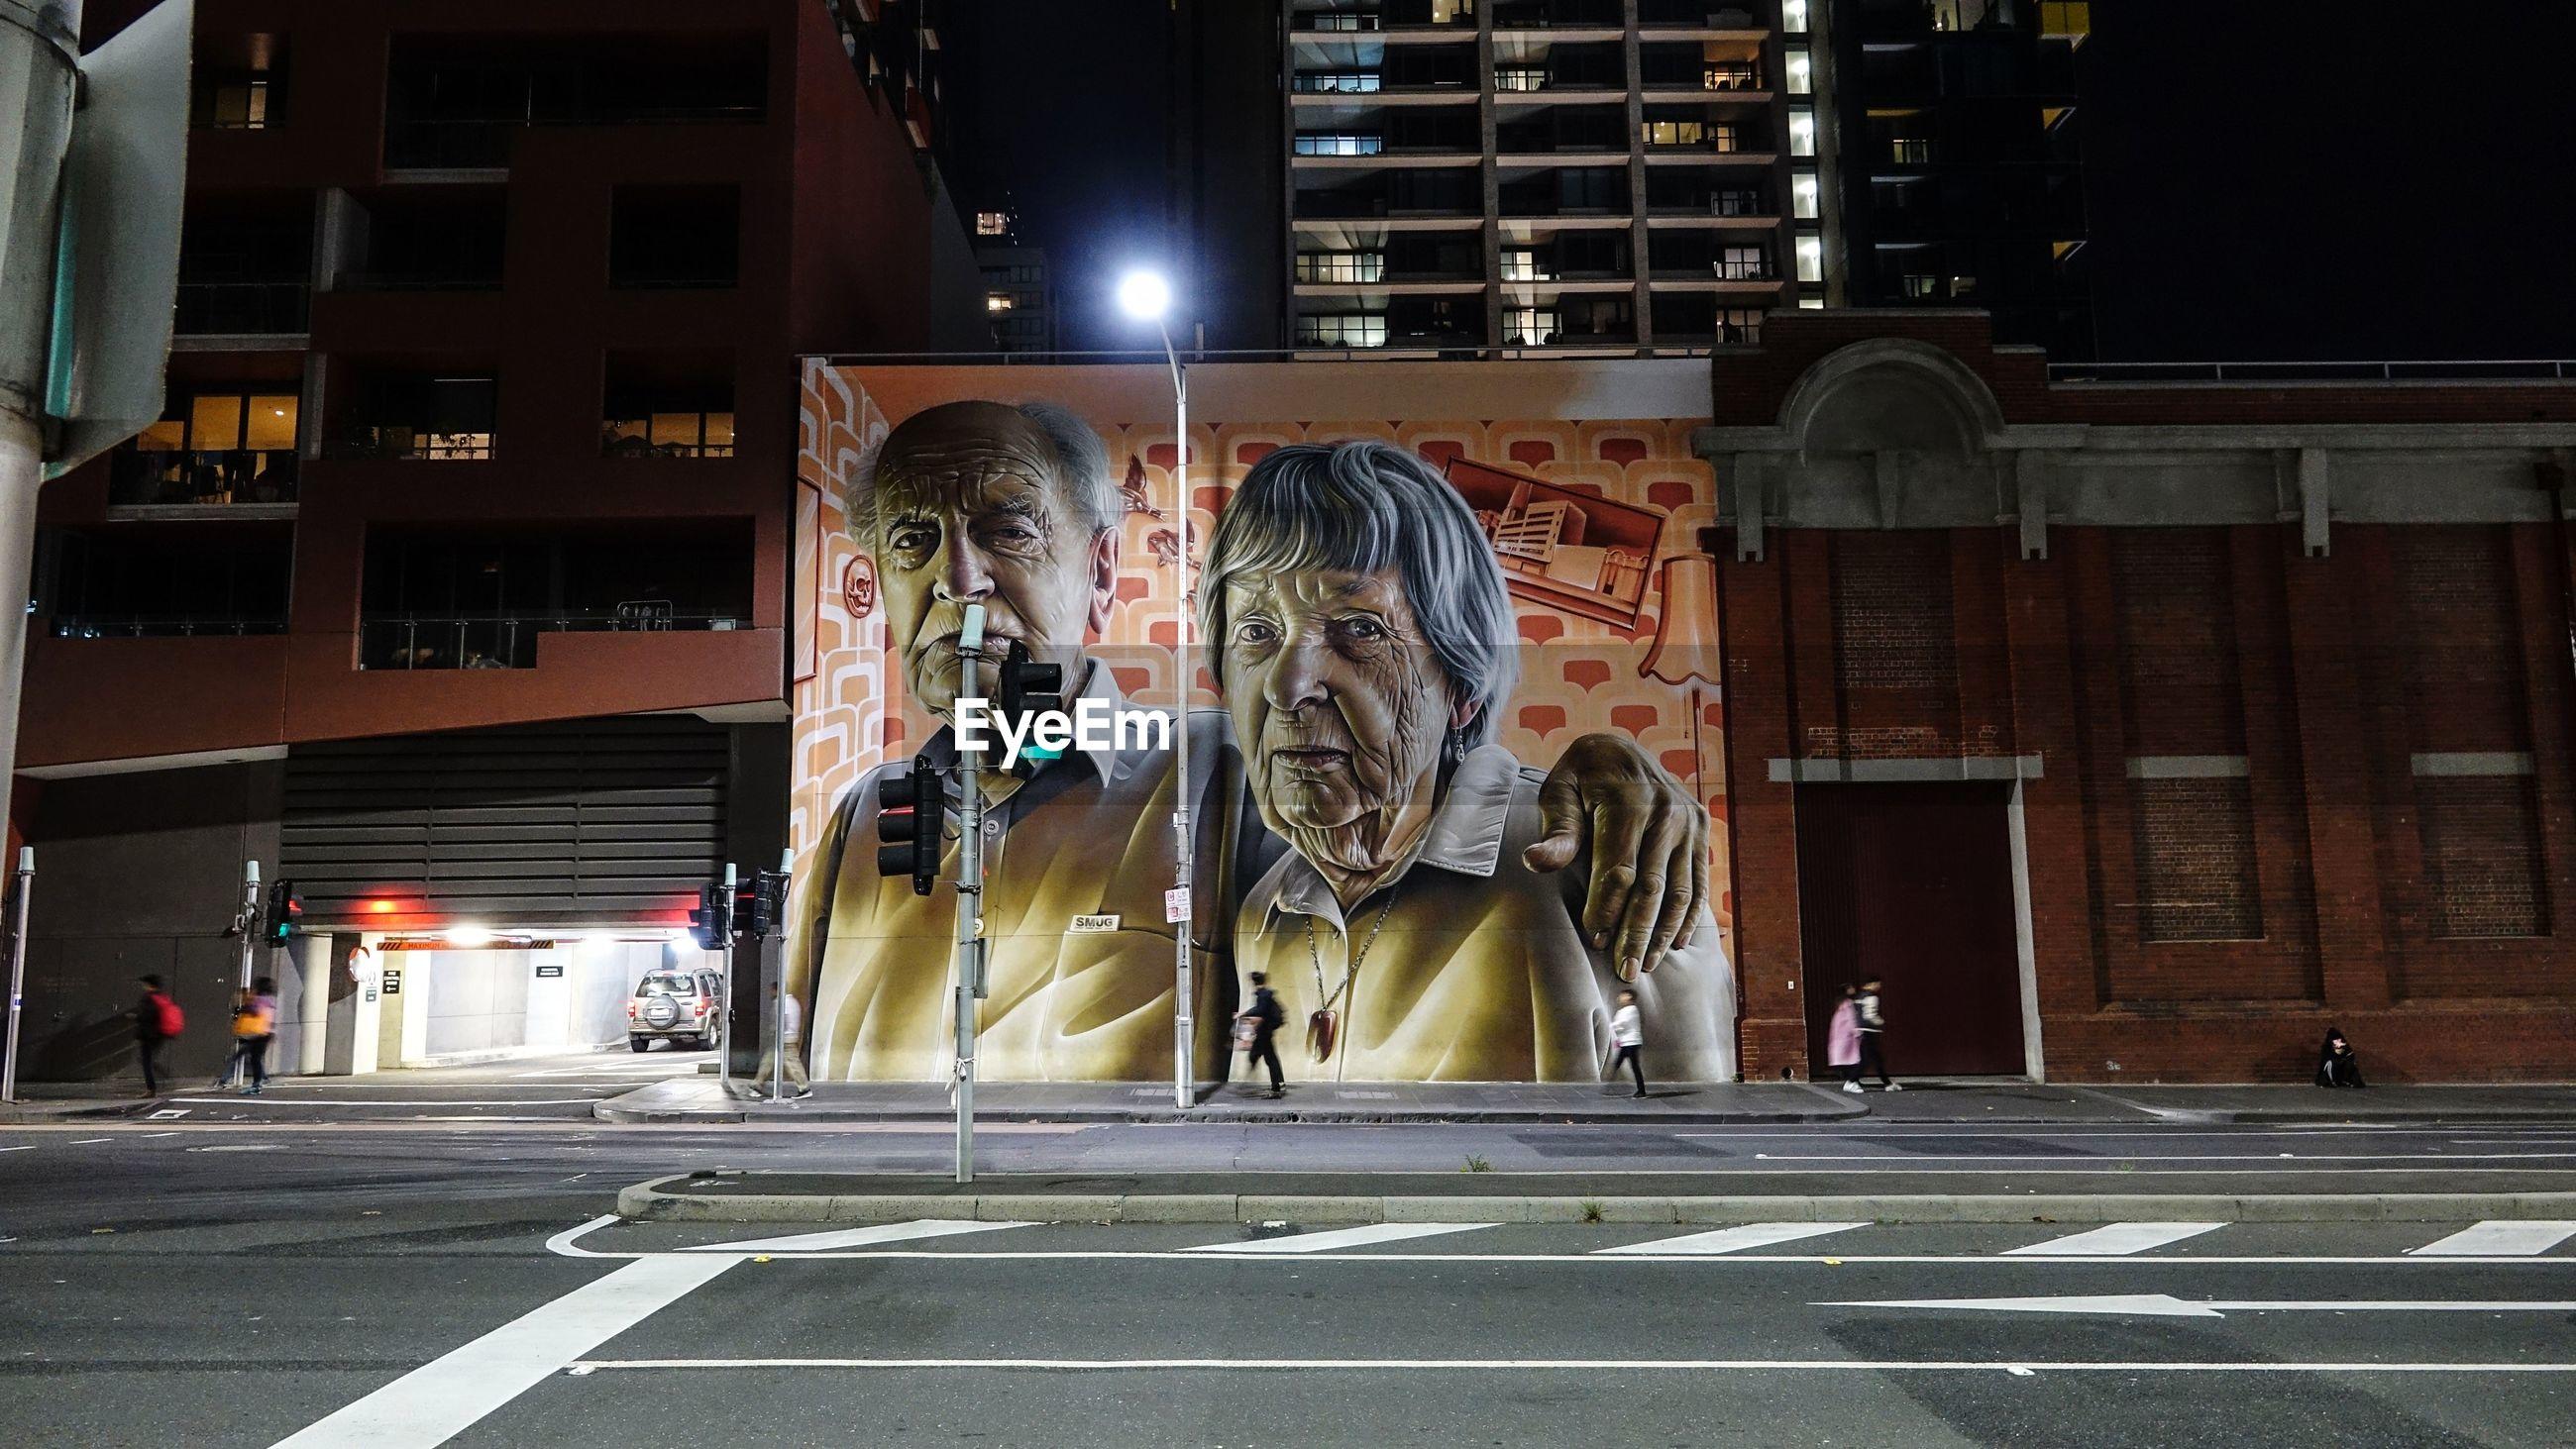 GRAFFITI ON BUILDING AT NIGHT